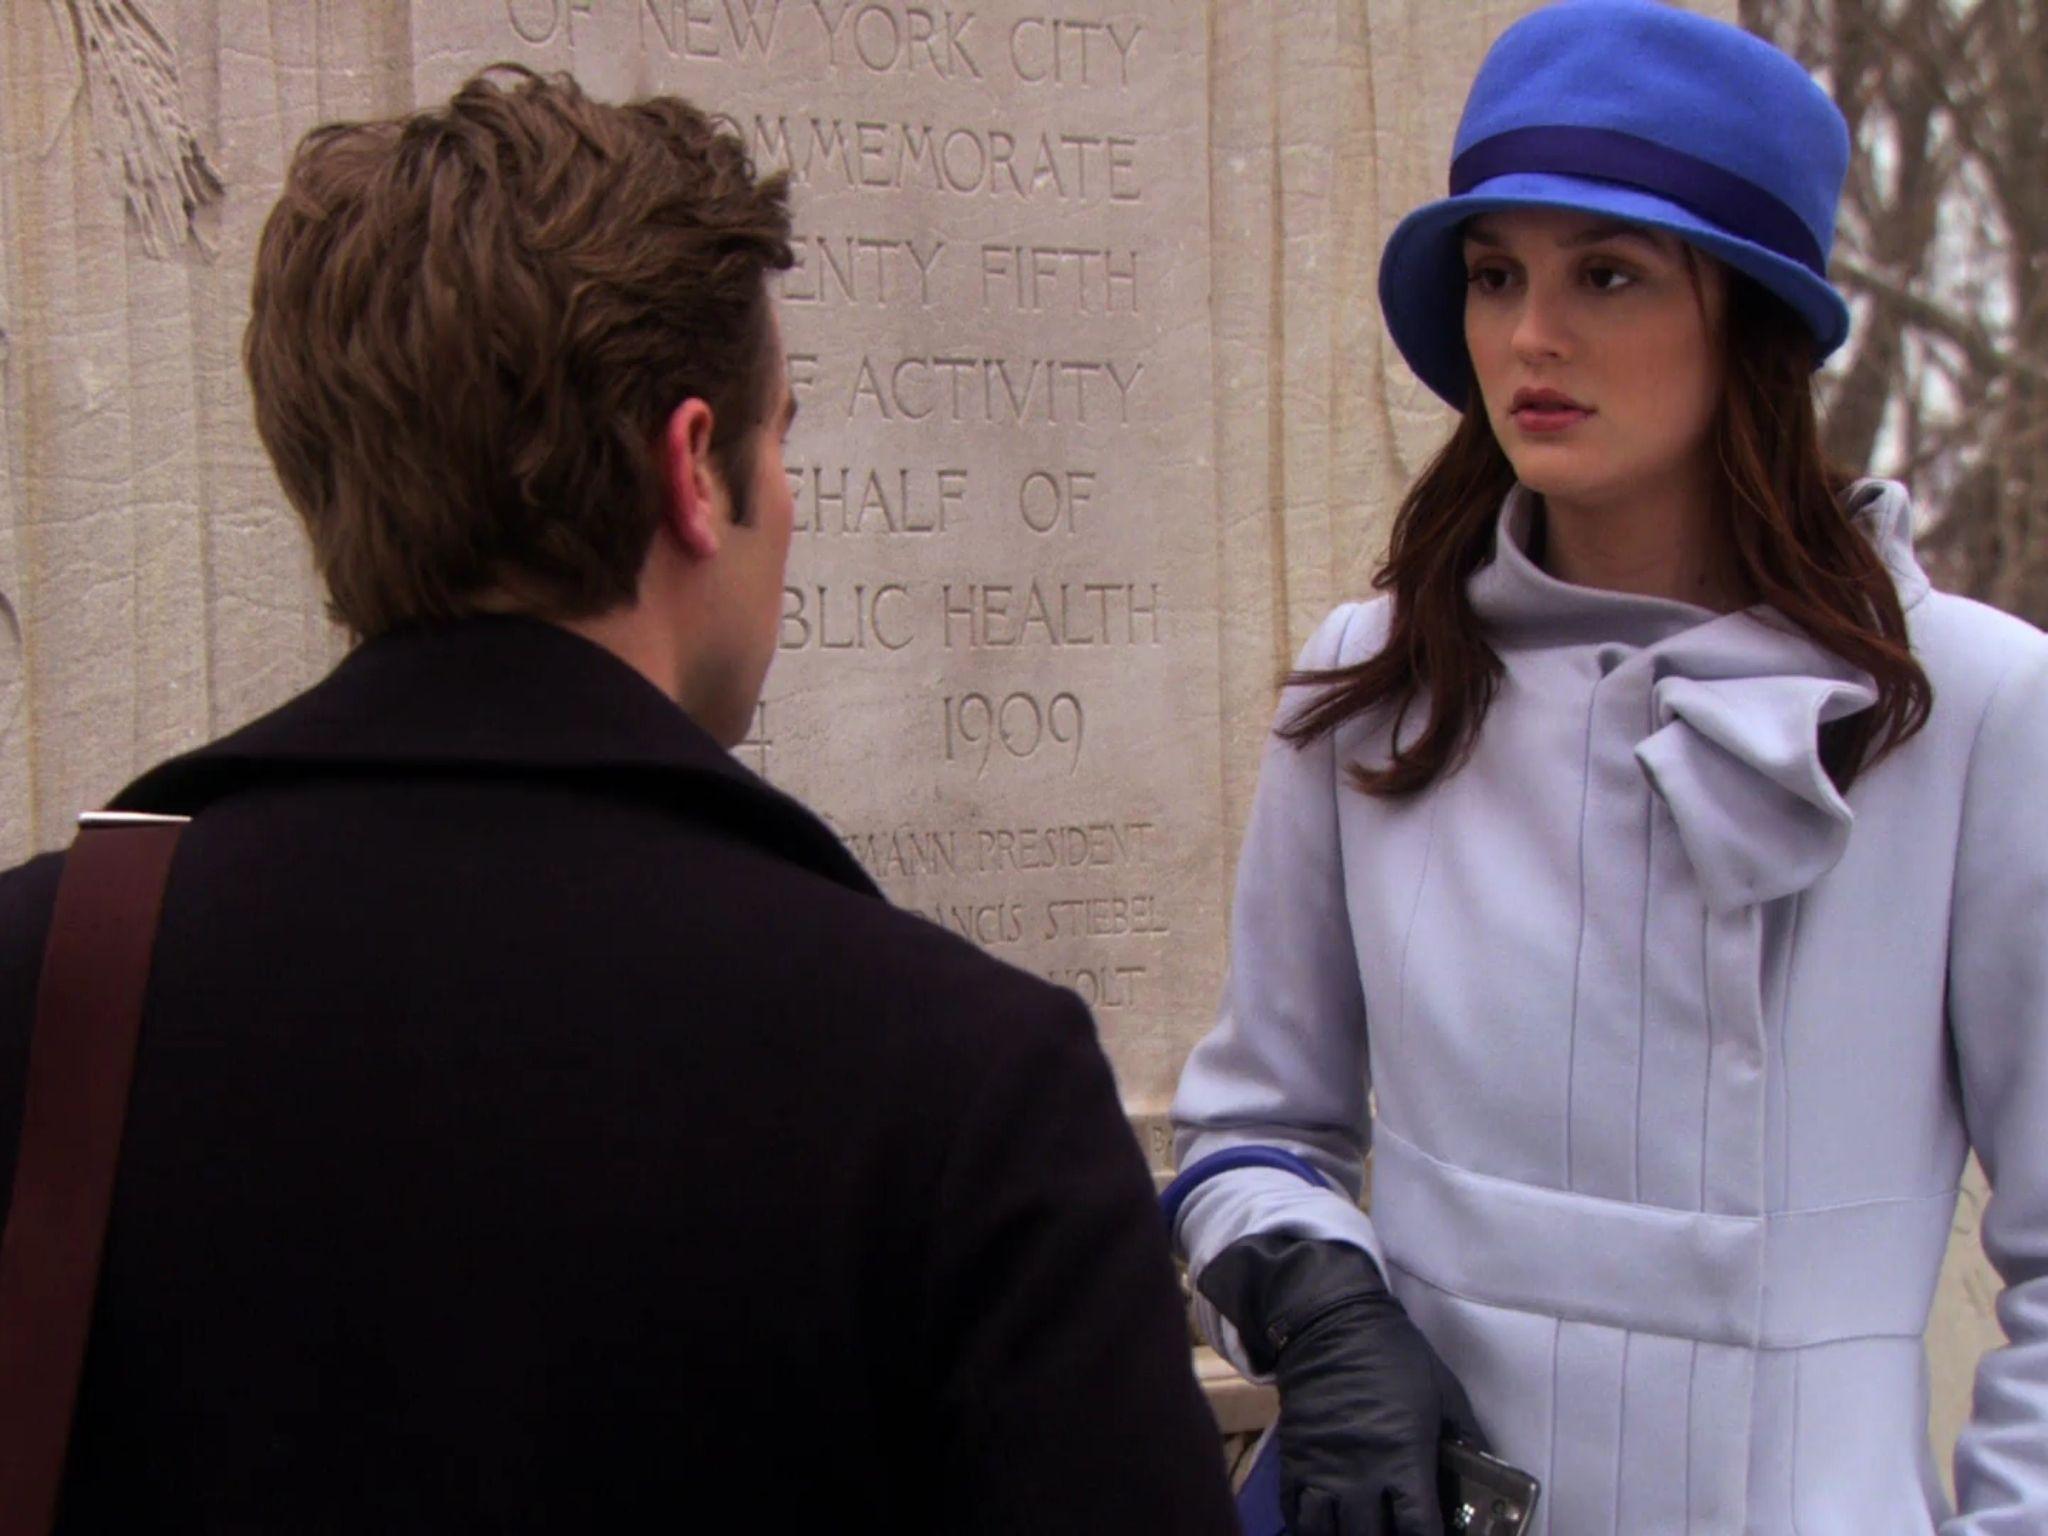 Blair waldorf gossip girl violet purple blue hat and coat street